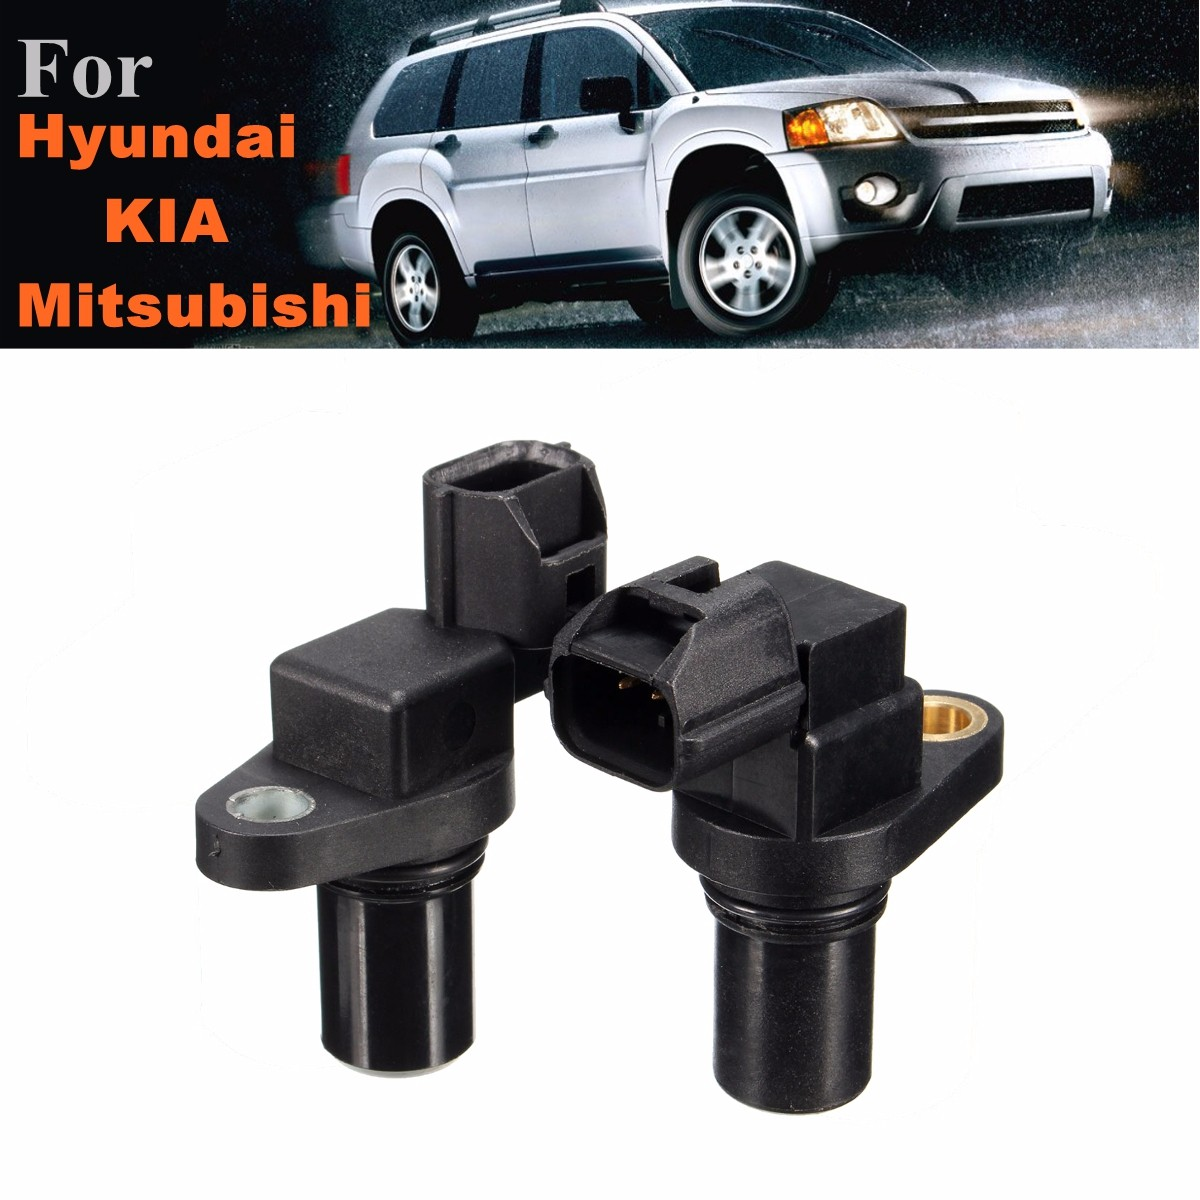 42620-39200 42621-39200 Pair Transmission Input & Output Speed Sensor For Chrysler For Dodge For Hyundai For KIA For Mitsubishi